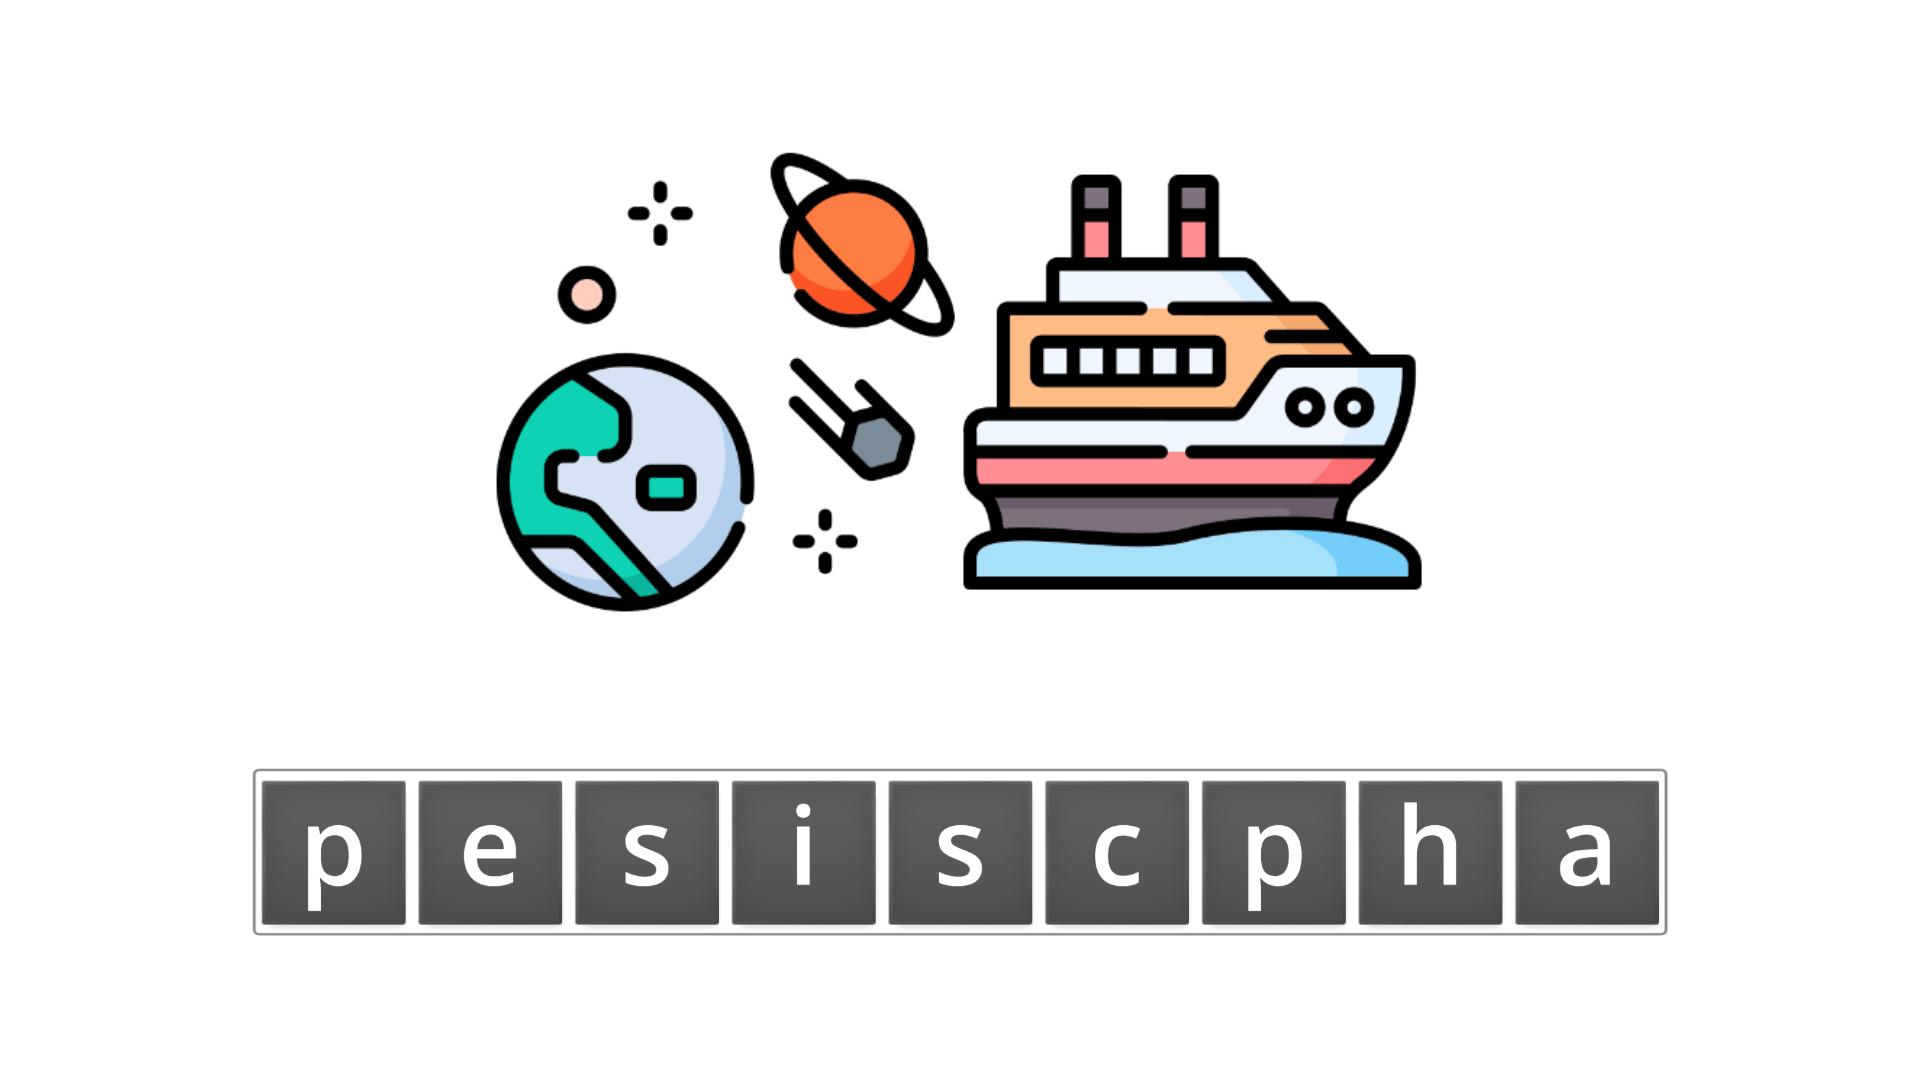 esl resources - flashcards - compound nouns  - unscramble - spaceship